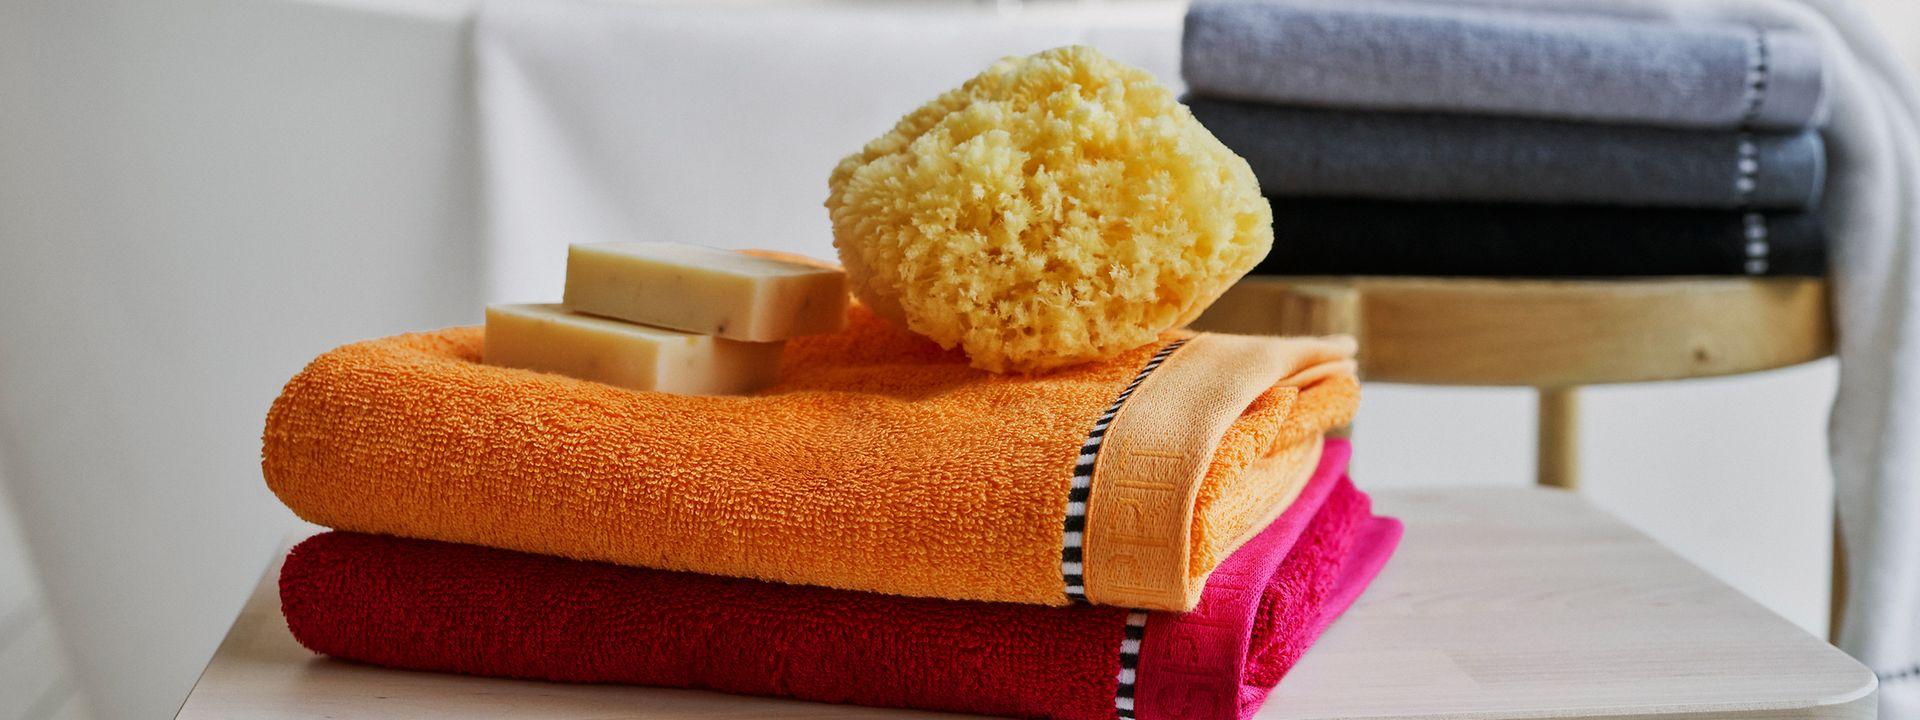 222021 - home - startpage - main banner - Bathroom - IMG